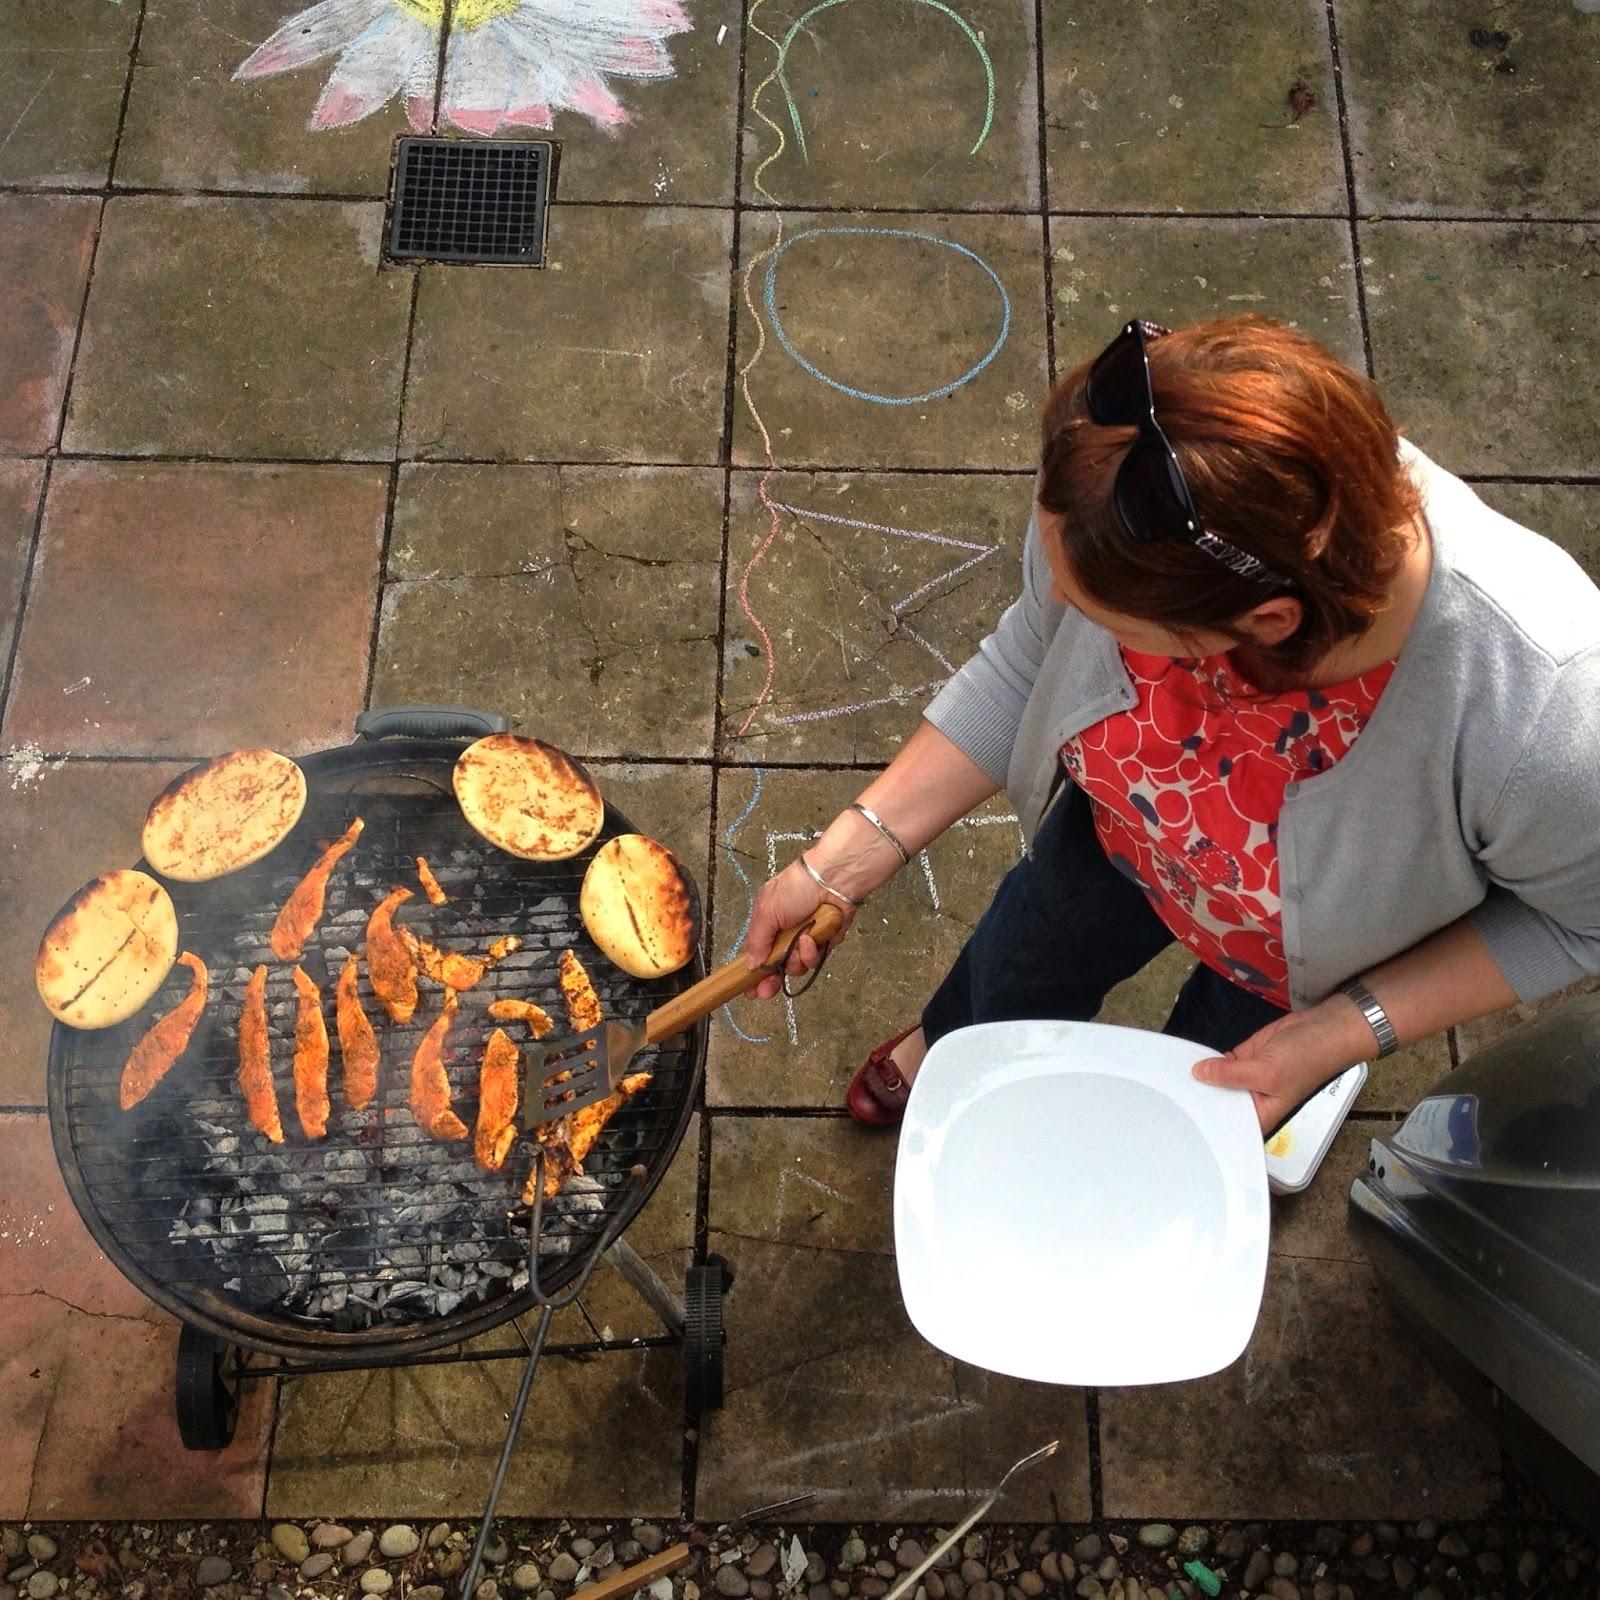 BBQ grilling fish